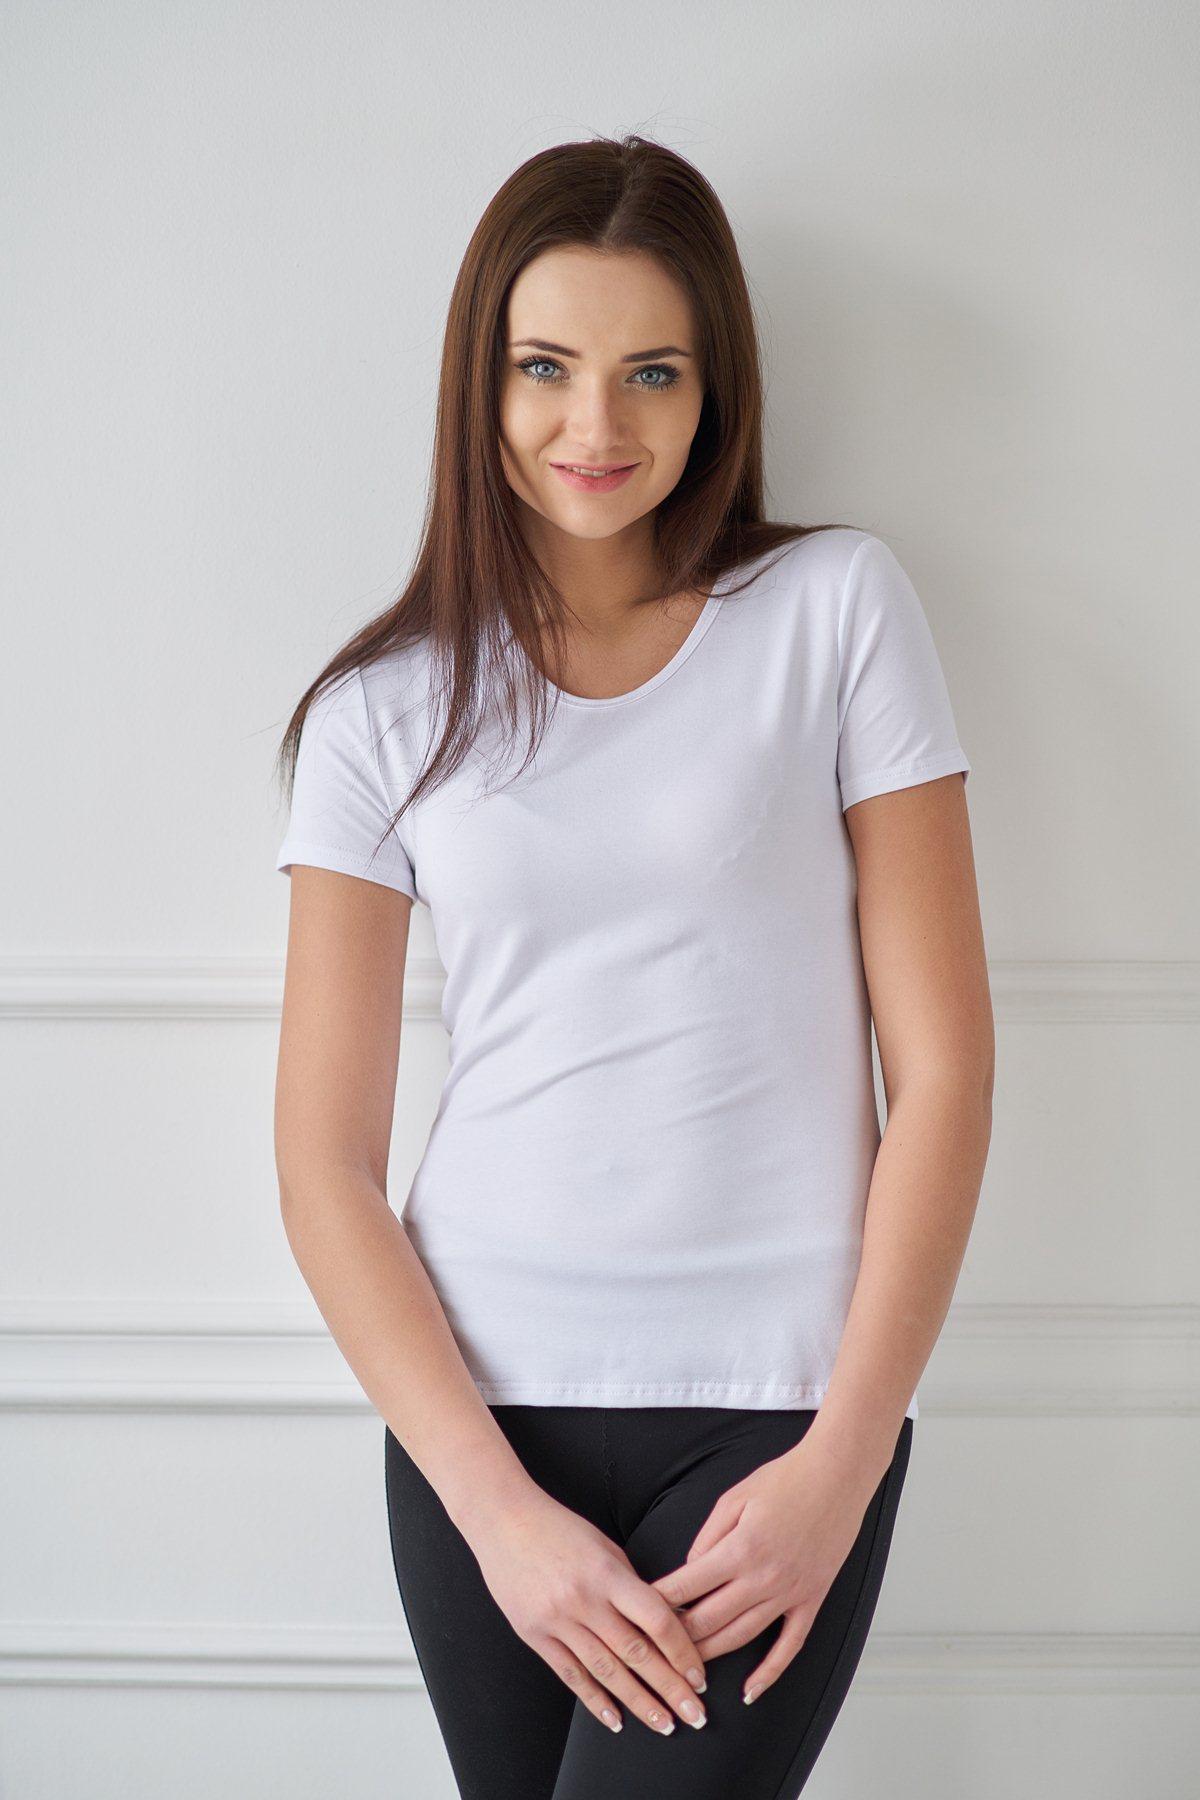 Жен. футболка арт. 19-0033 Белый р. 54Майки и футболки<br>Факт. ОГ: 100 см <br>Факт. ОТ: 96 см <br>Факт. ОБ: 108 см <br>Длина по спинке: 66 см<br><br>Тип: Жен. футболка<br>Размер: 54<br>Материал: Вискоза